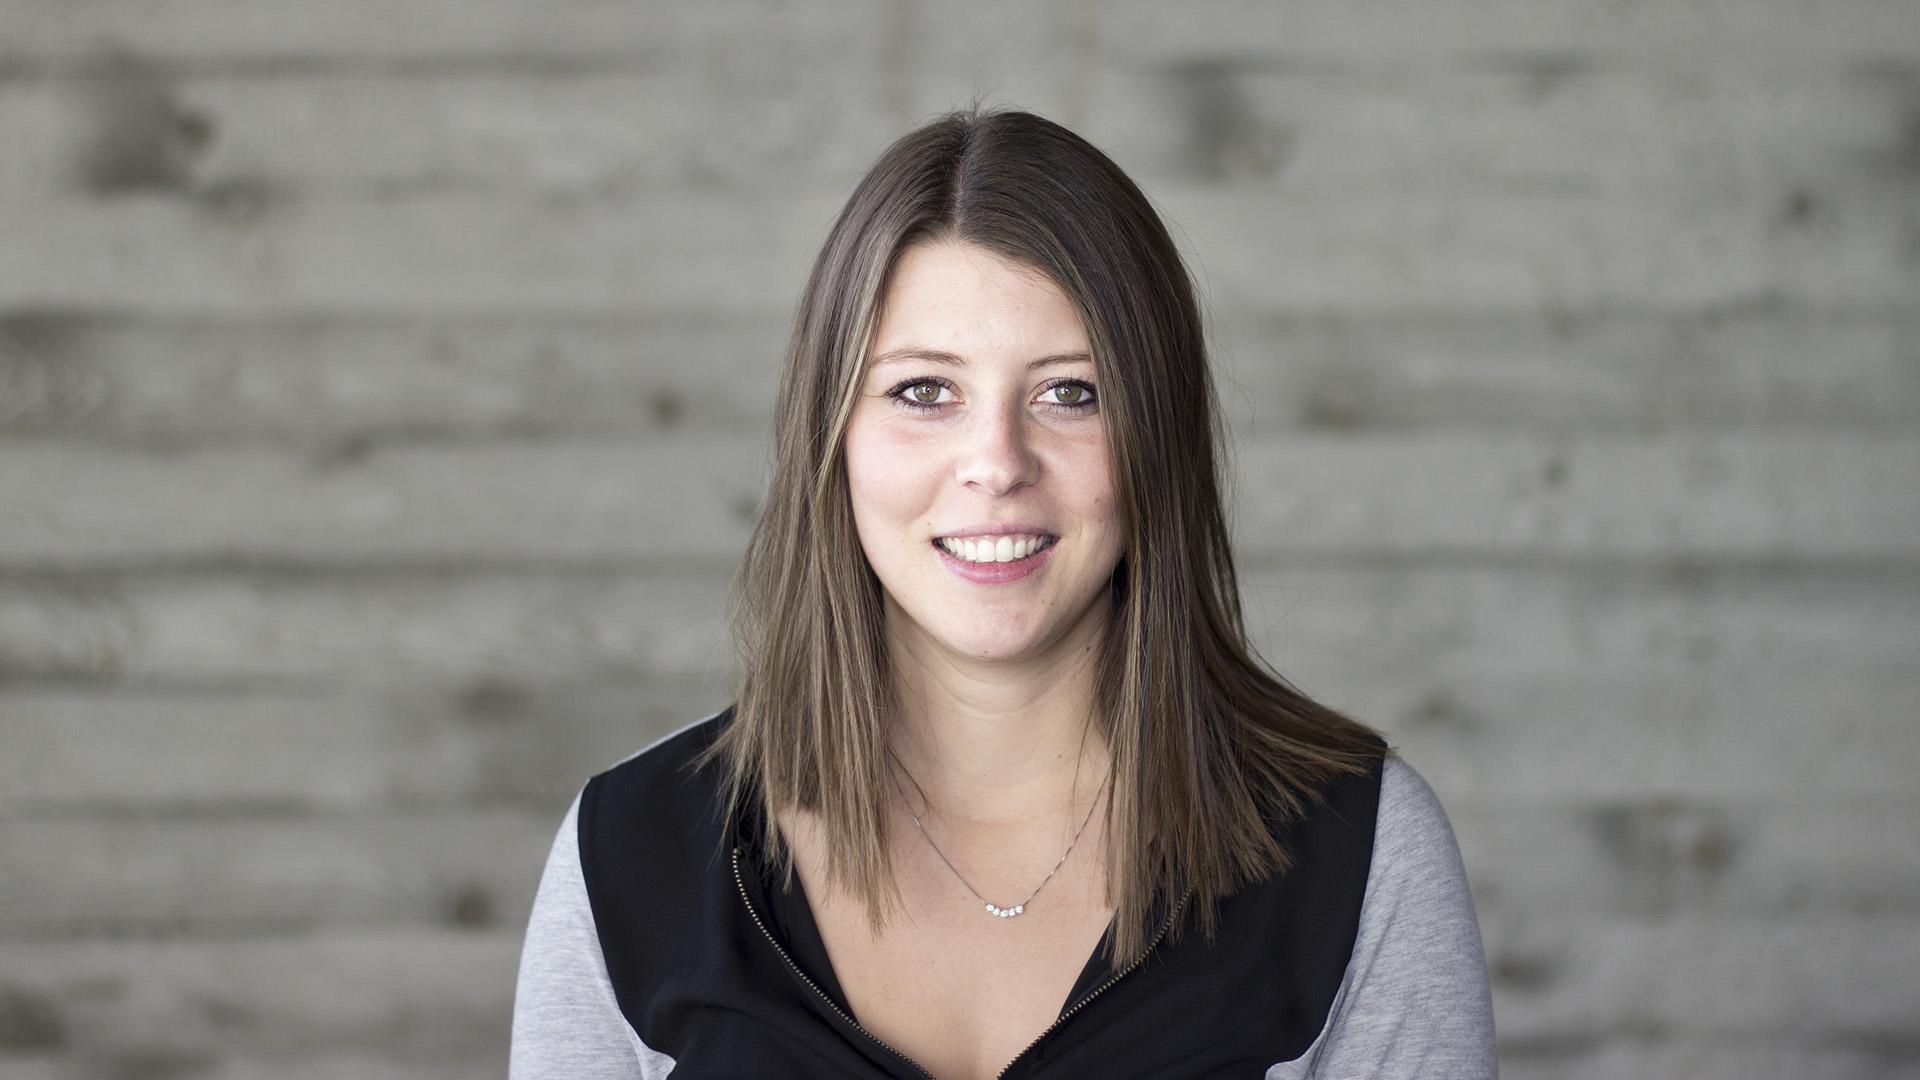 Johanna Weidle